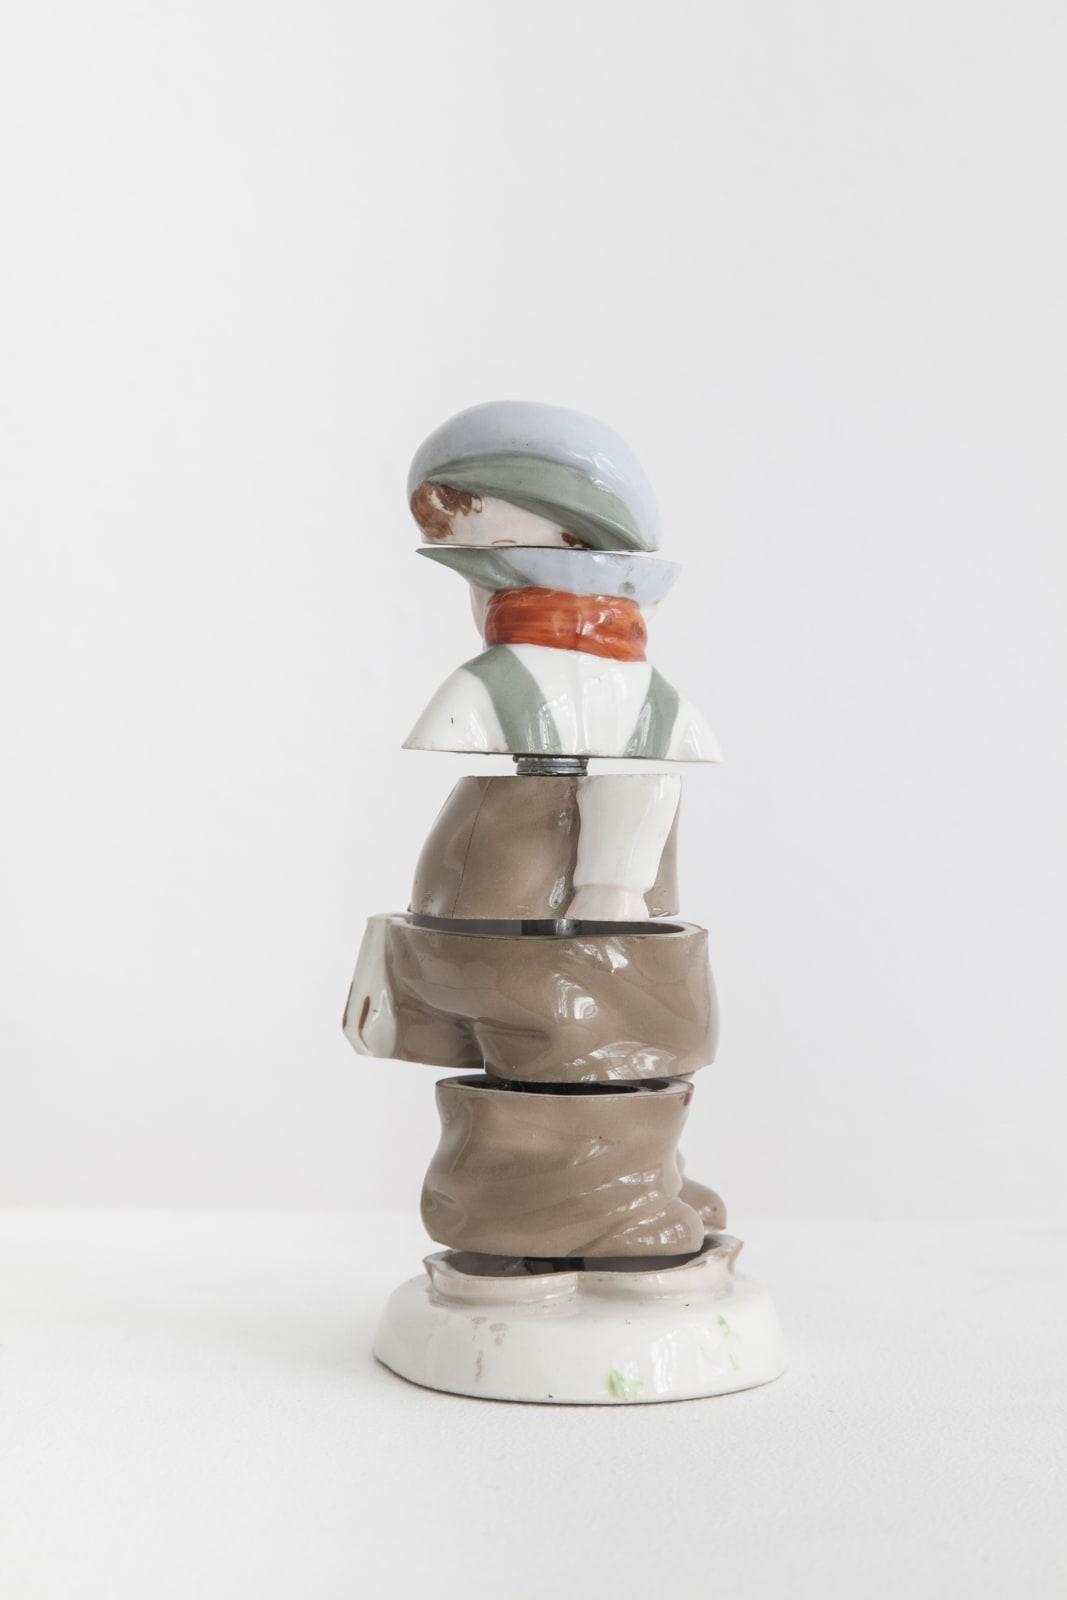 Pavla Scerankova, Uncertain observer, 2015, kinetic object, ceramics, steel, 16 x 8 x 7 cm